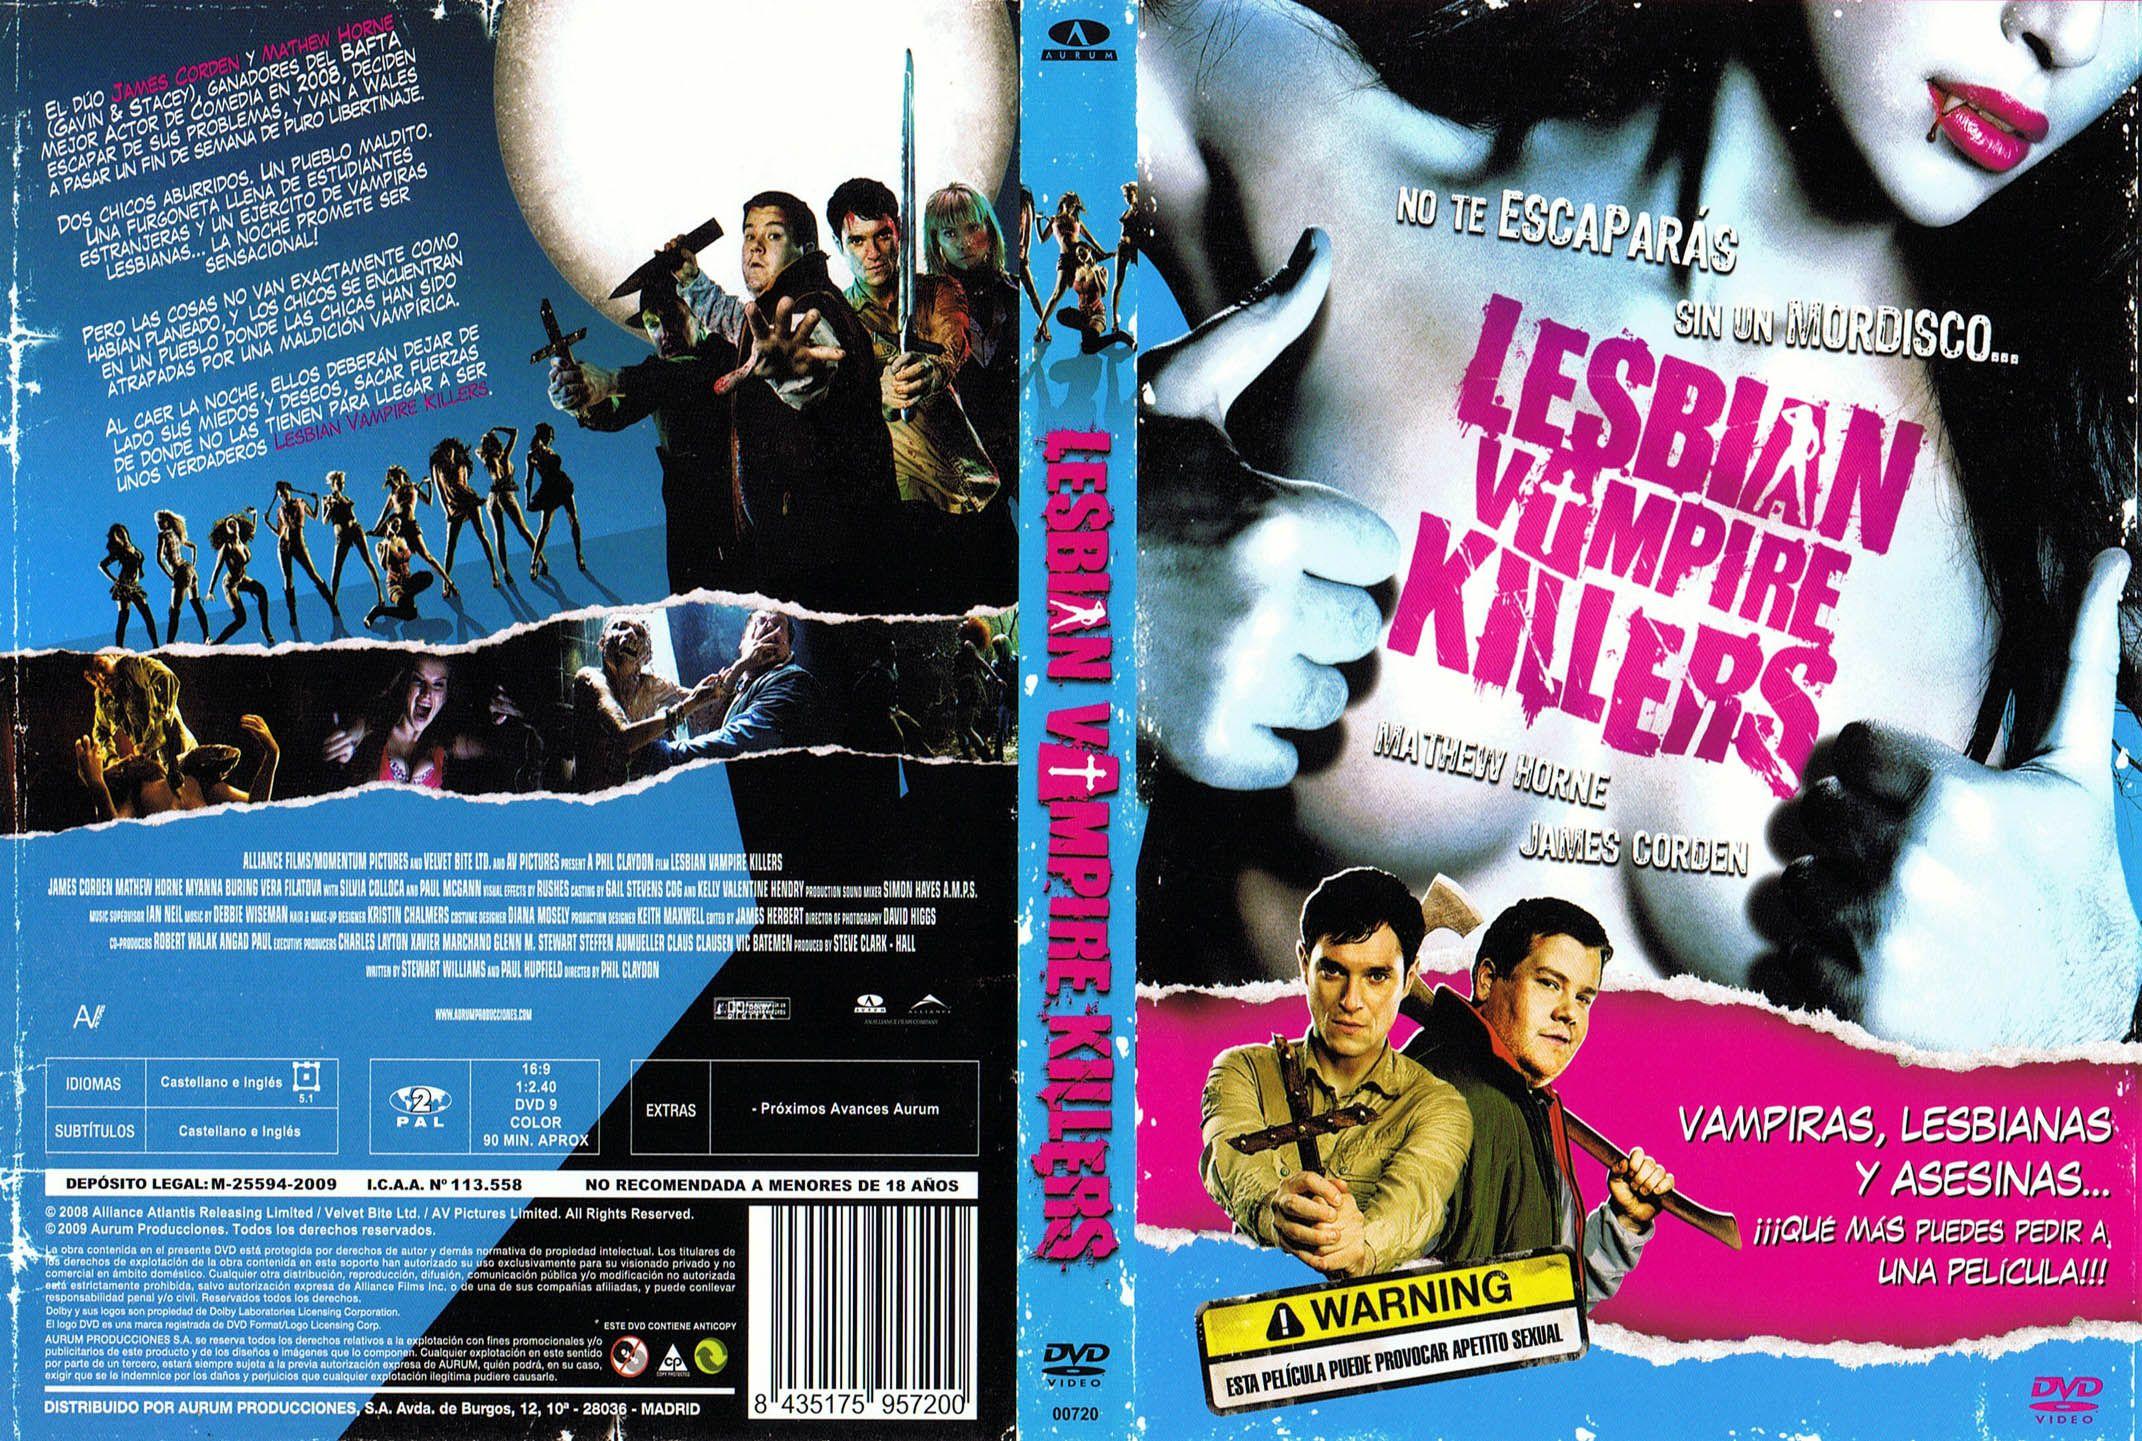 Download legal barley lesbian vampire movies free porn videos